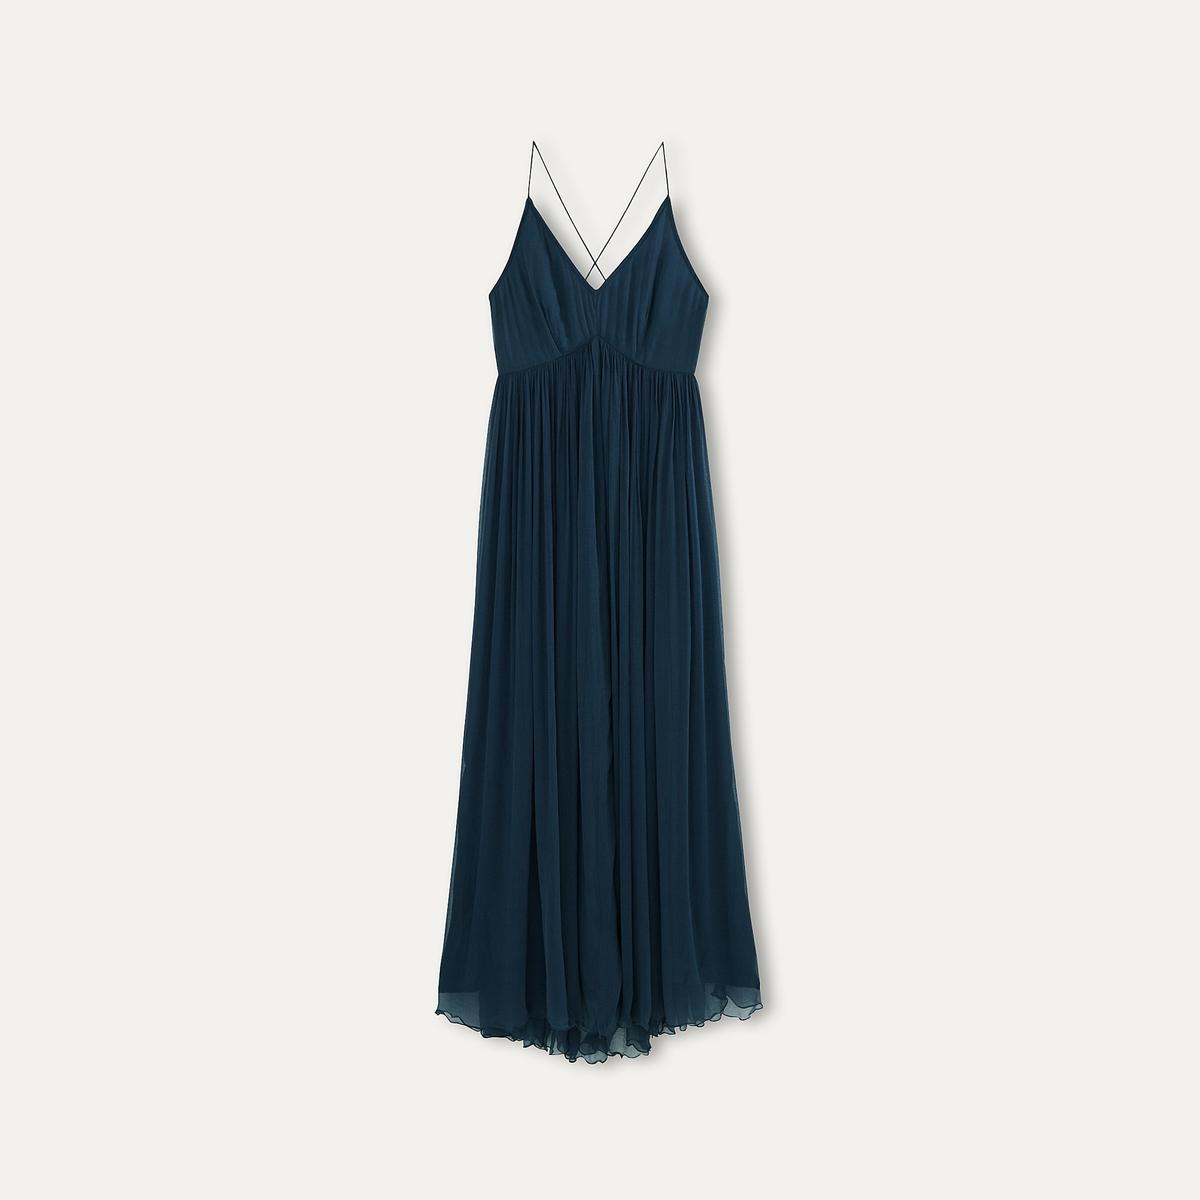 Платье MES DEMOISELLES 45790 от LaRedoute